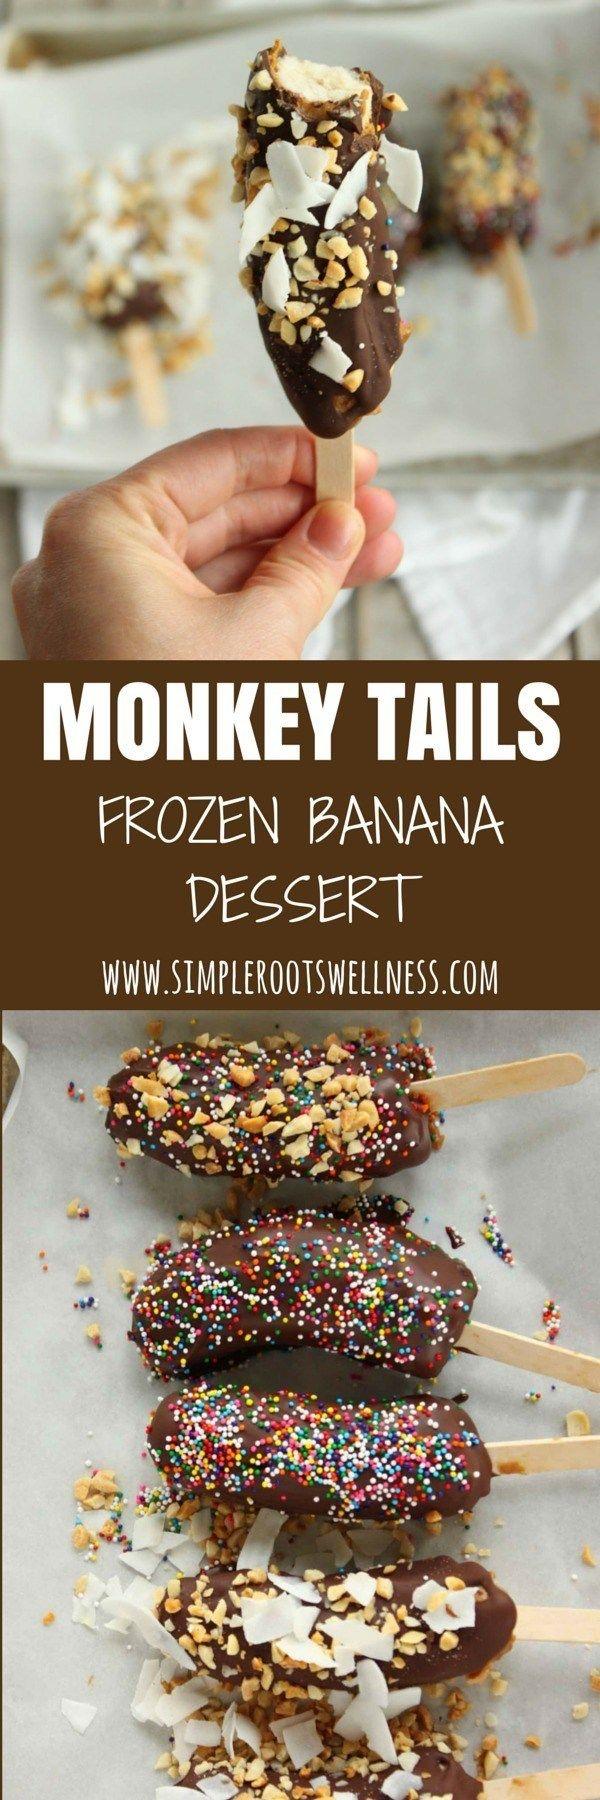 Monkey Tails Frozen Banana Dessert | simplerootswellness.com